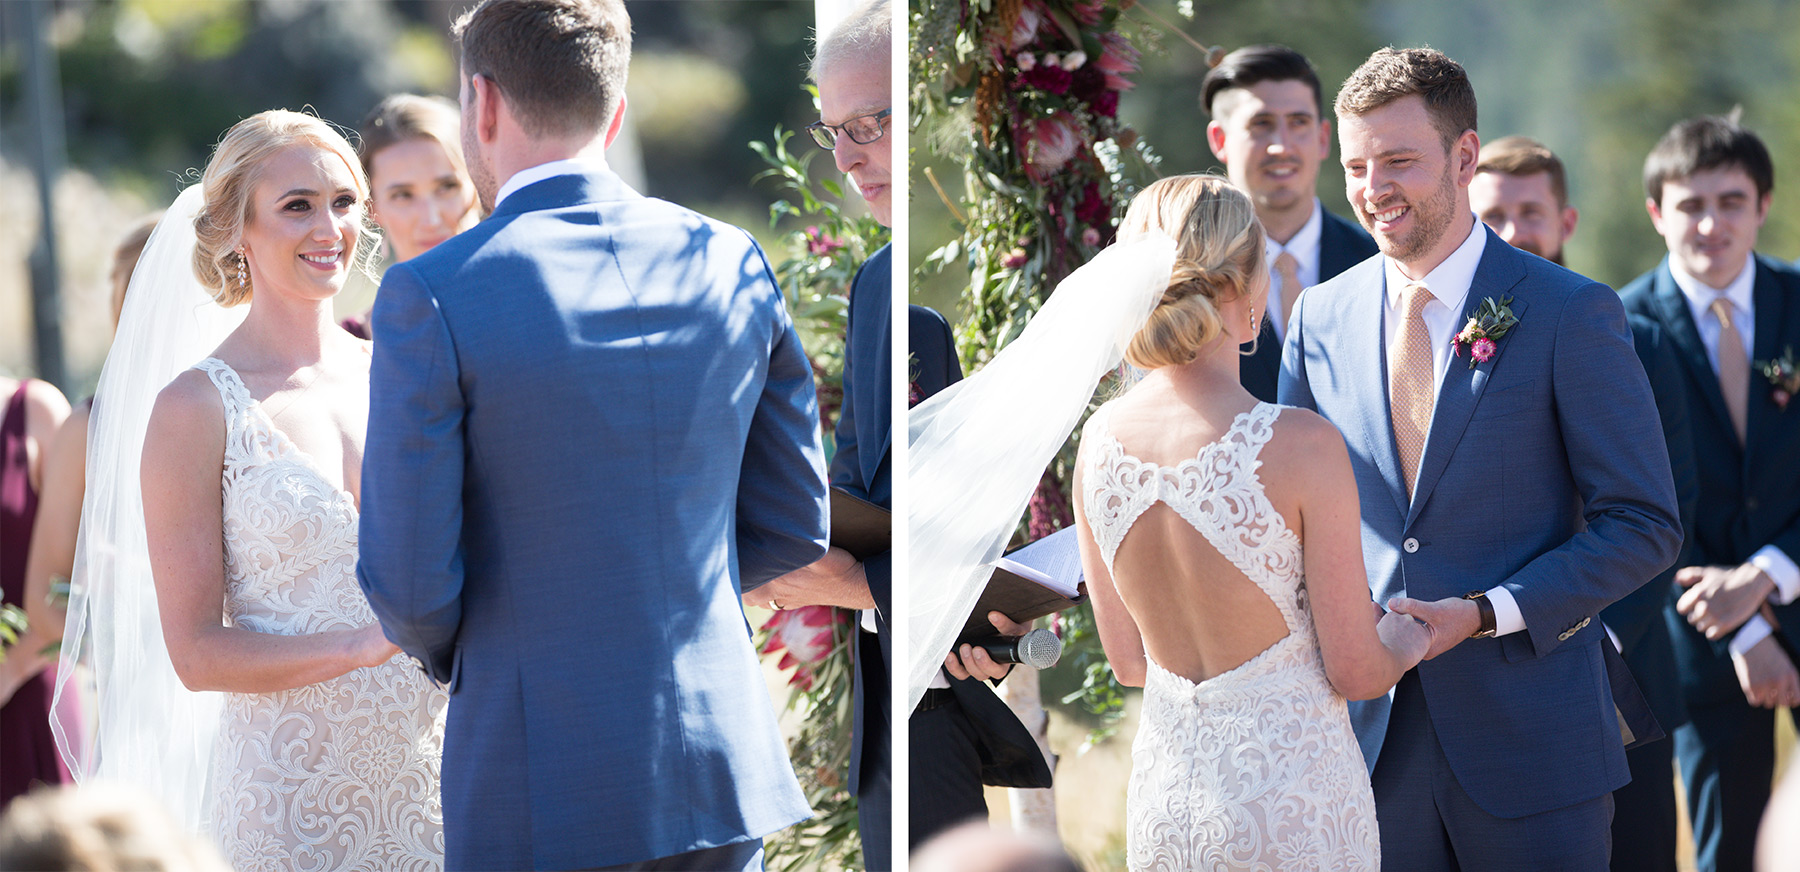 ceremony-weddings-Zephyr-Lodge-Truckee